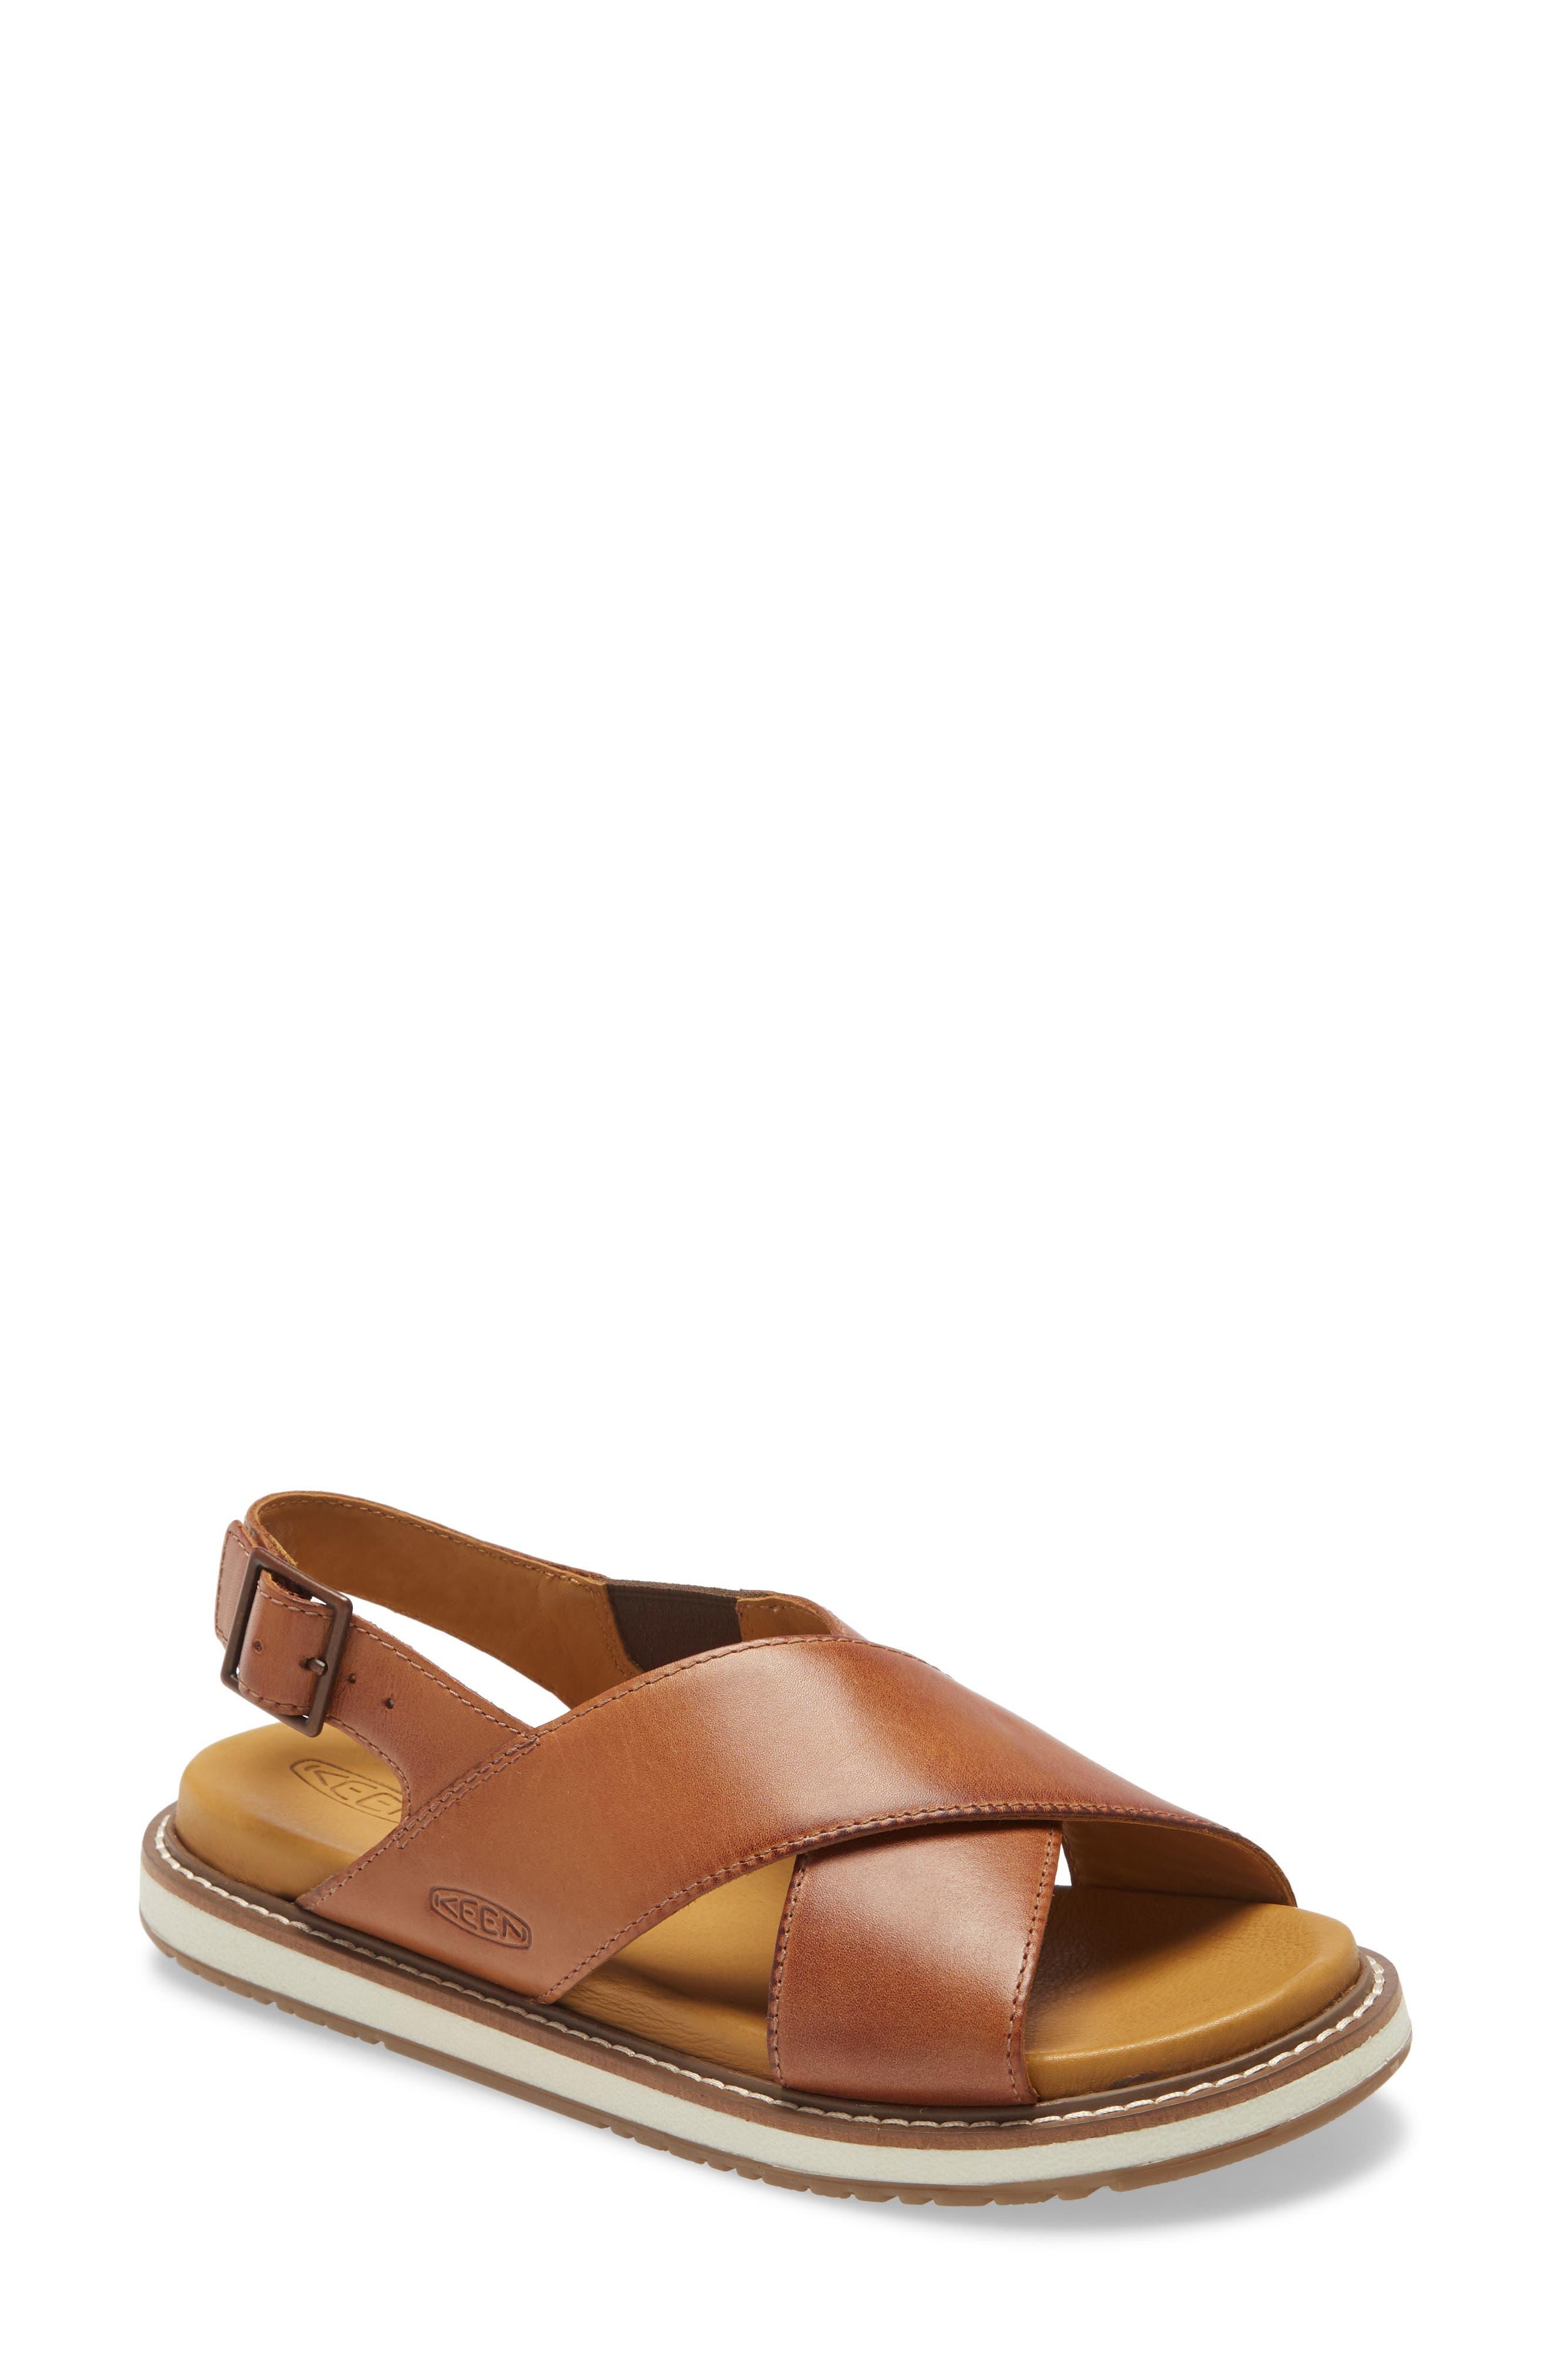 Lana Cross Strap Sandal